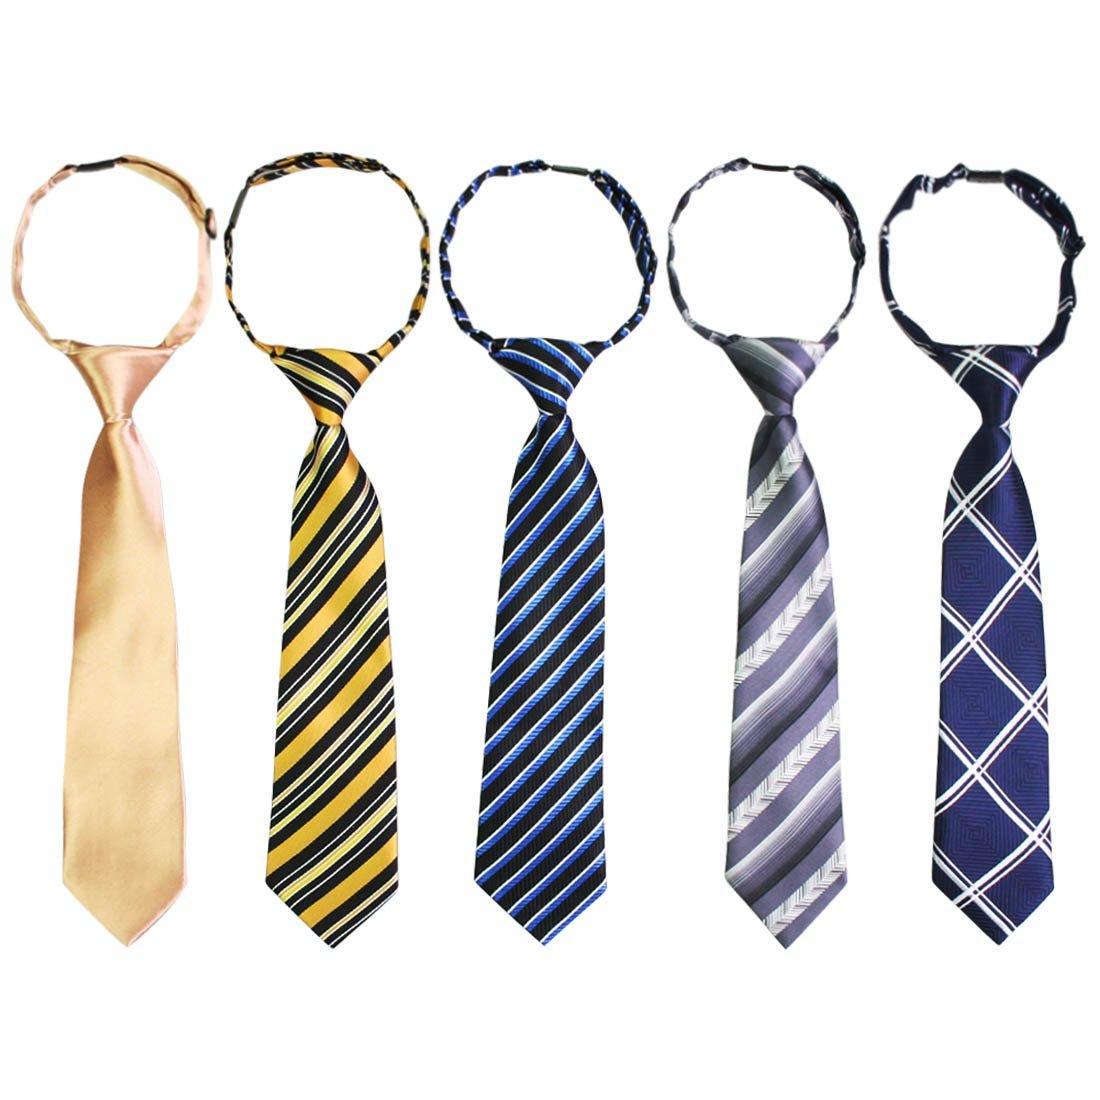 kilofly Pre-tied Adjustable Neck Strap Tie Boys Baby Necktie Value Set of 5 by kilofly